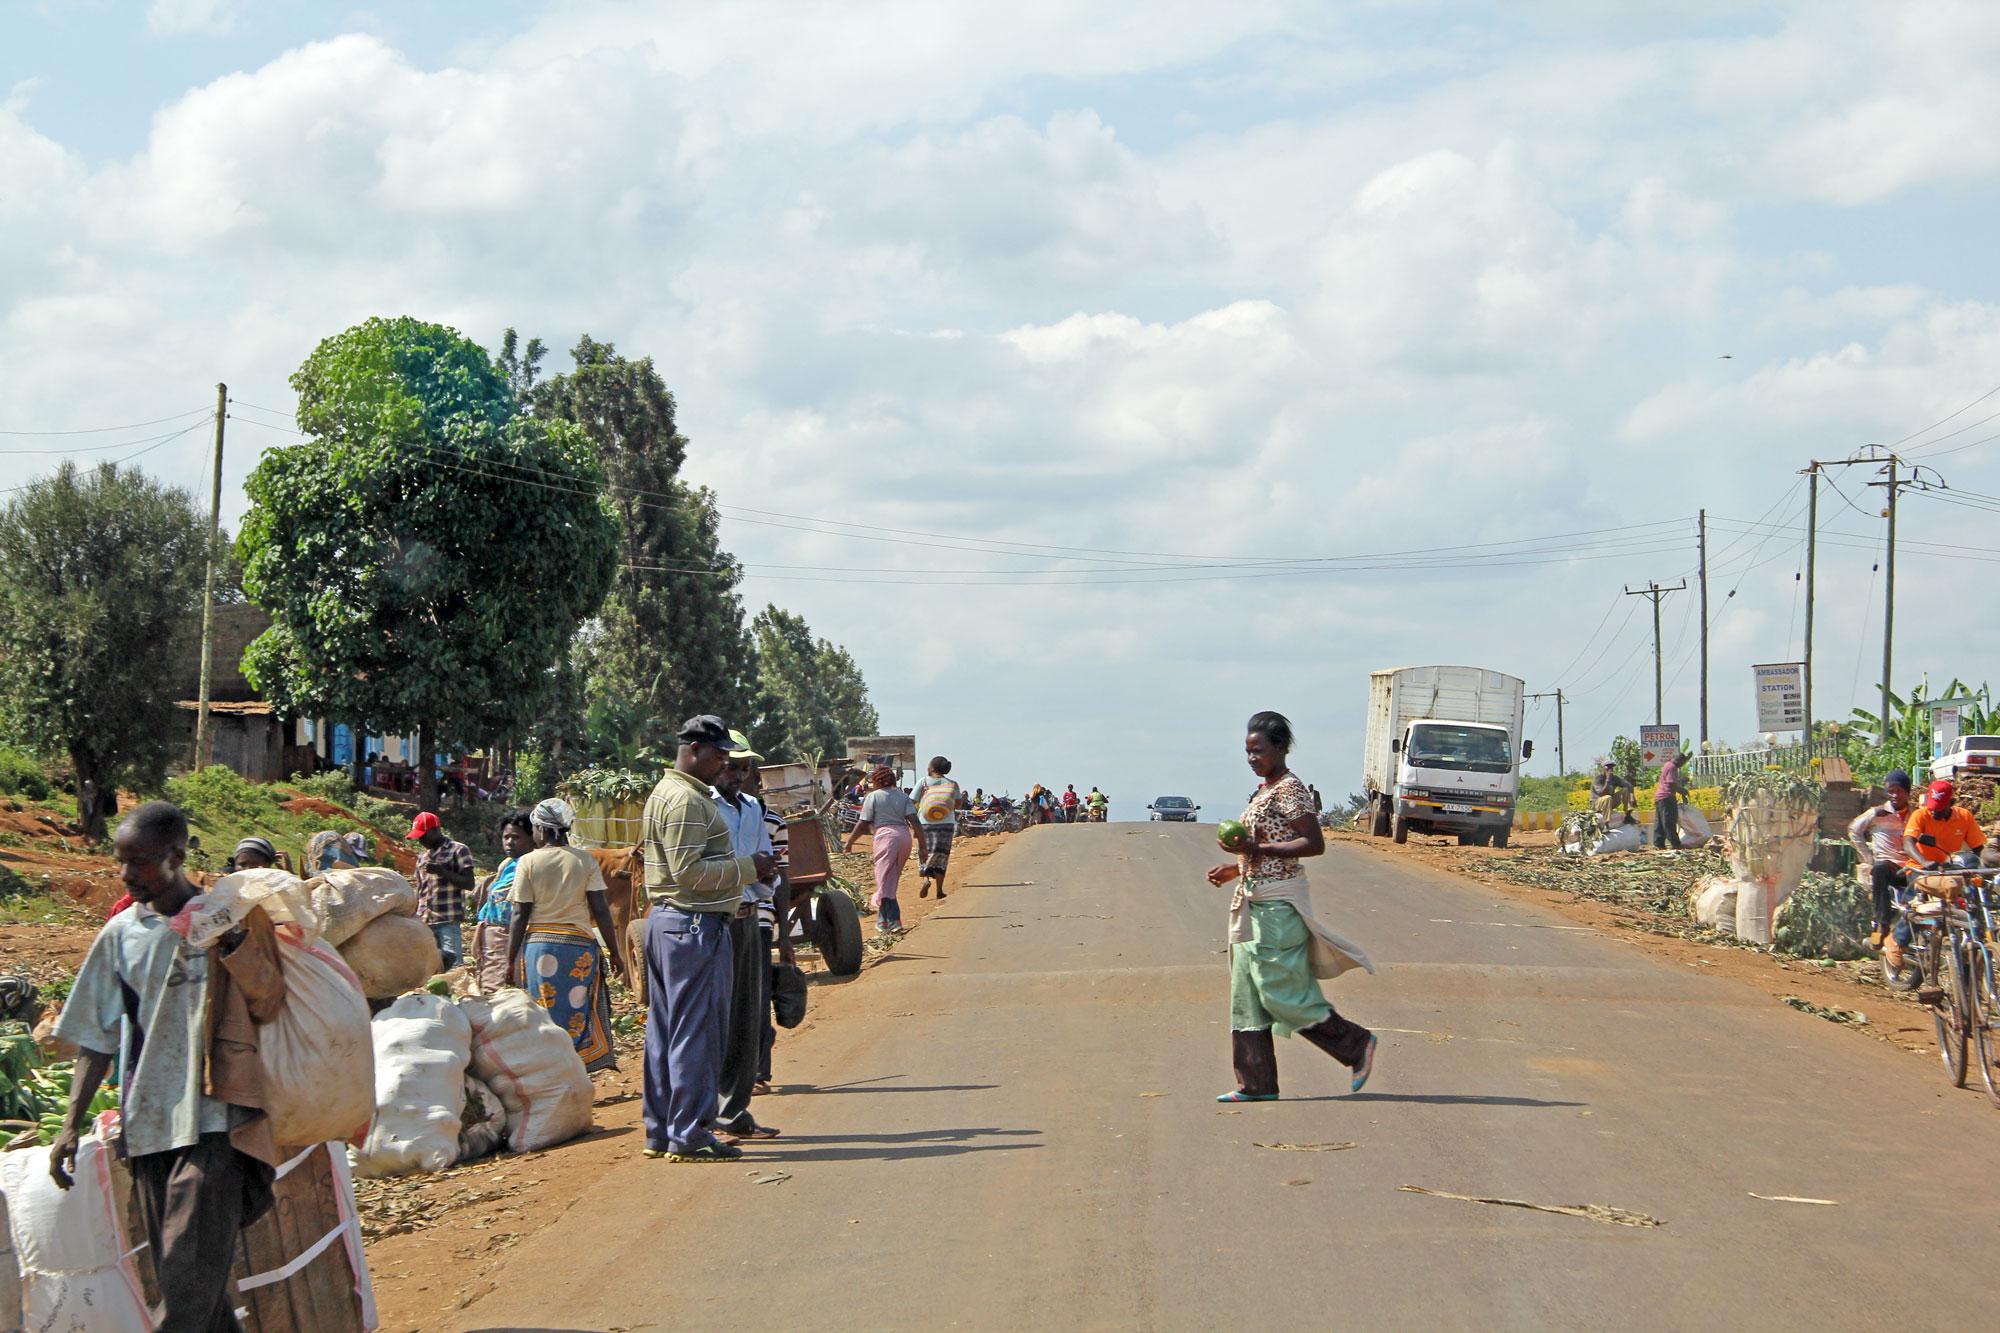 Trading along Kiambu Road, Kenya. CREDIT: Mikkel Poulsen